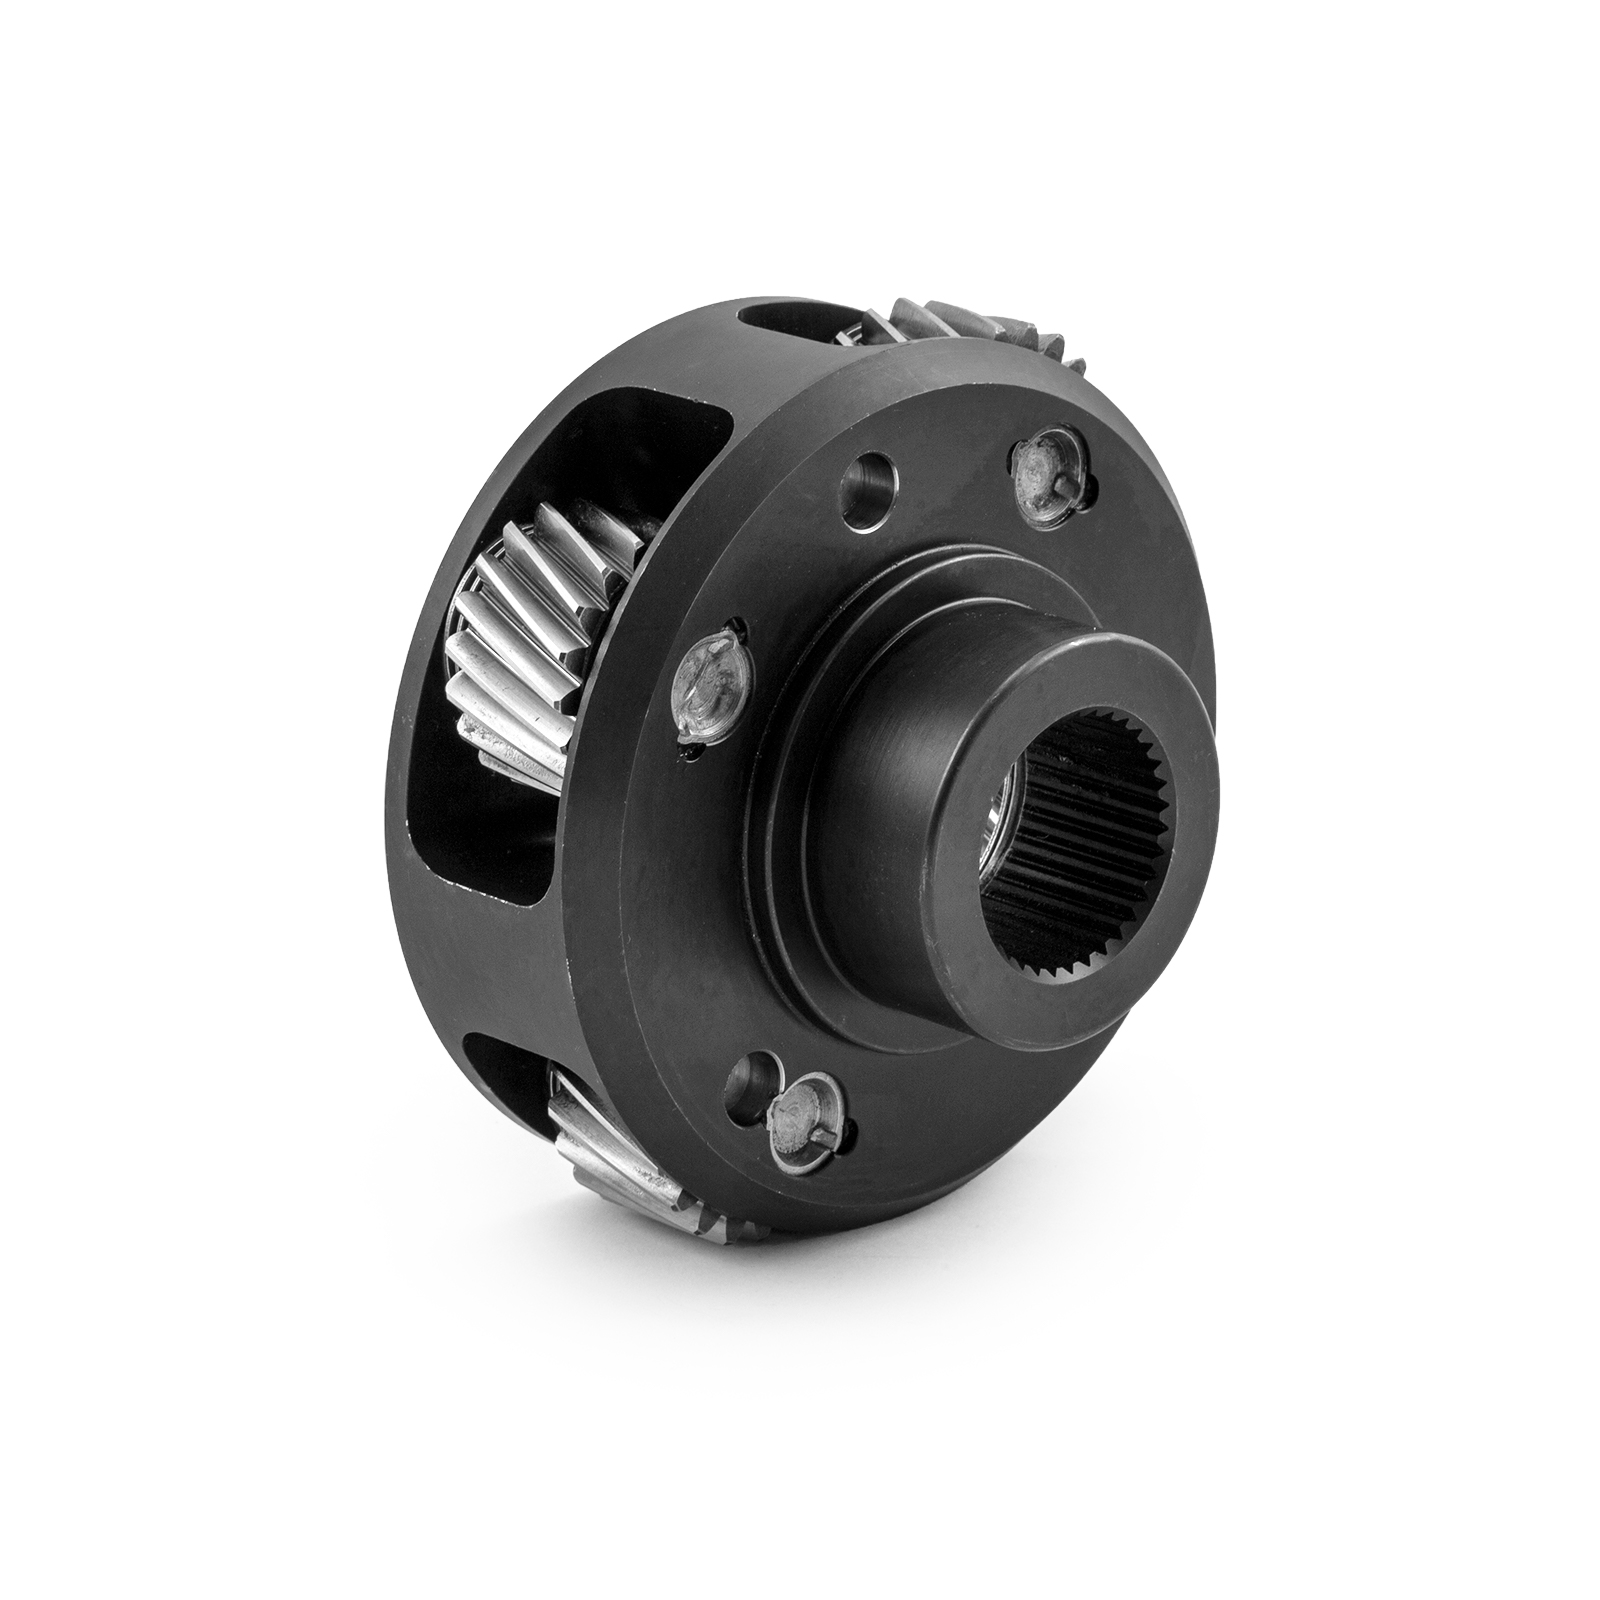 Ford C4 Transmission Performance 4 Pinion Planetary Gear Set